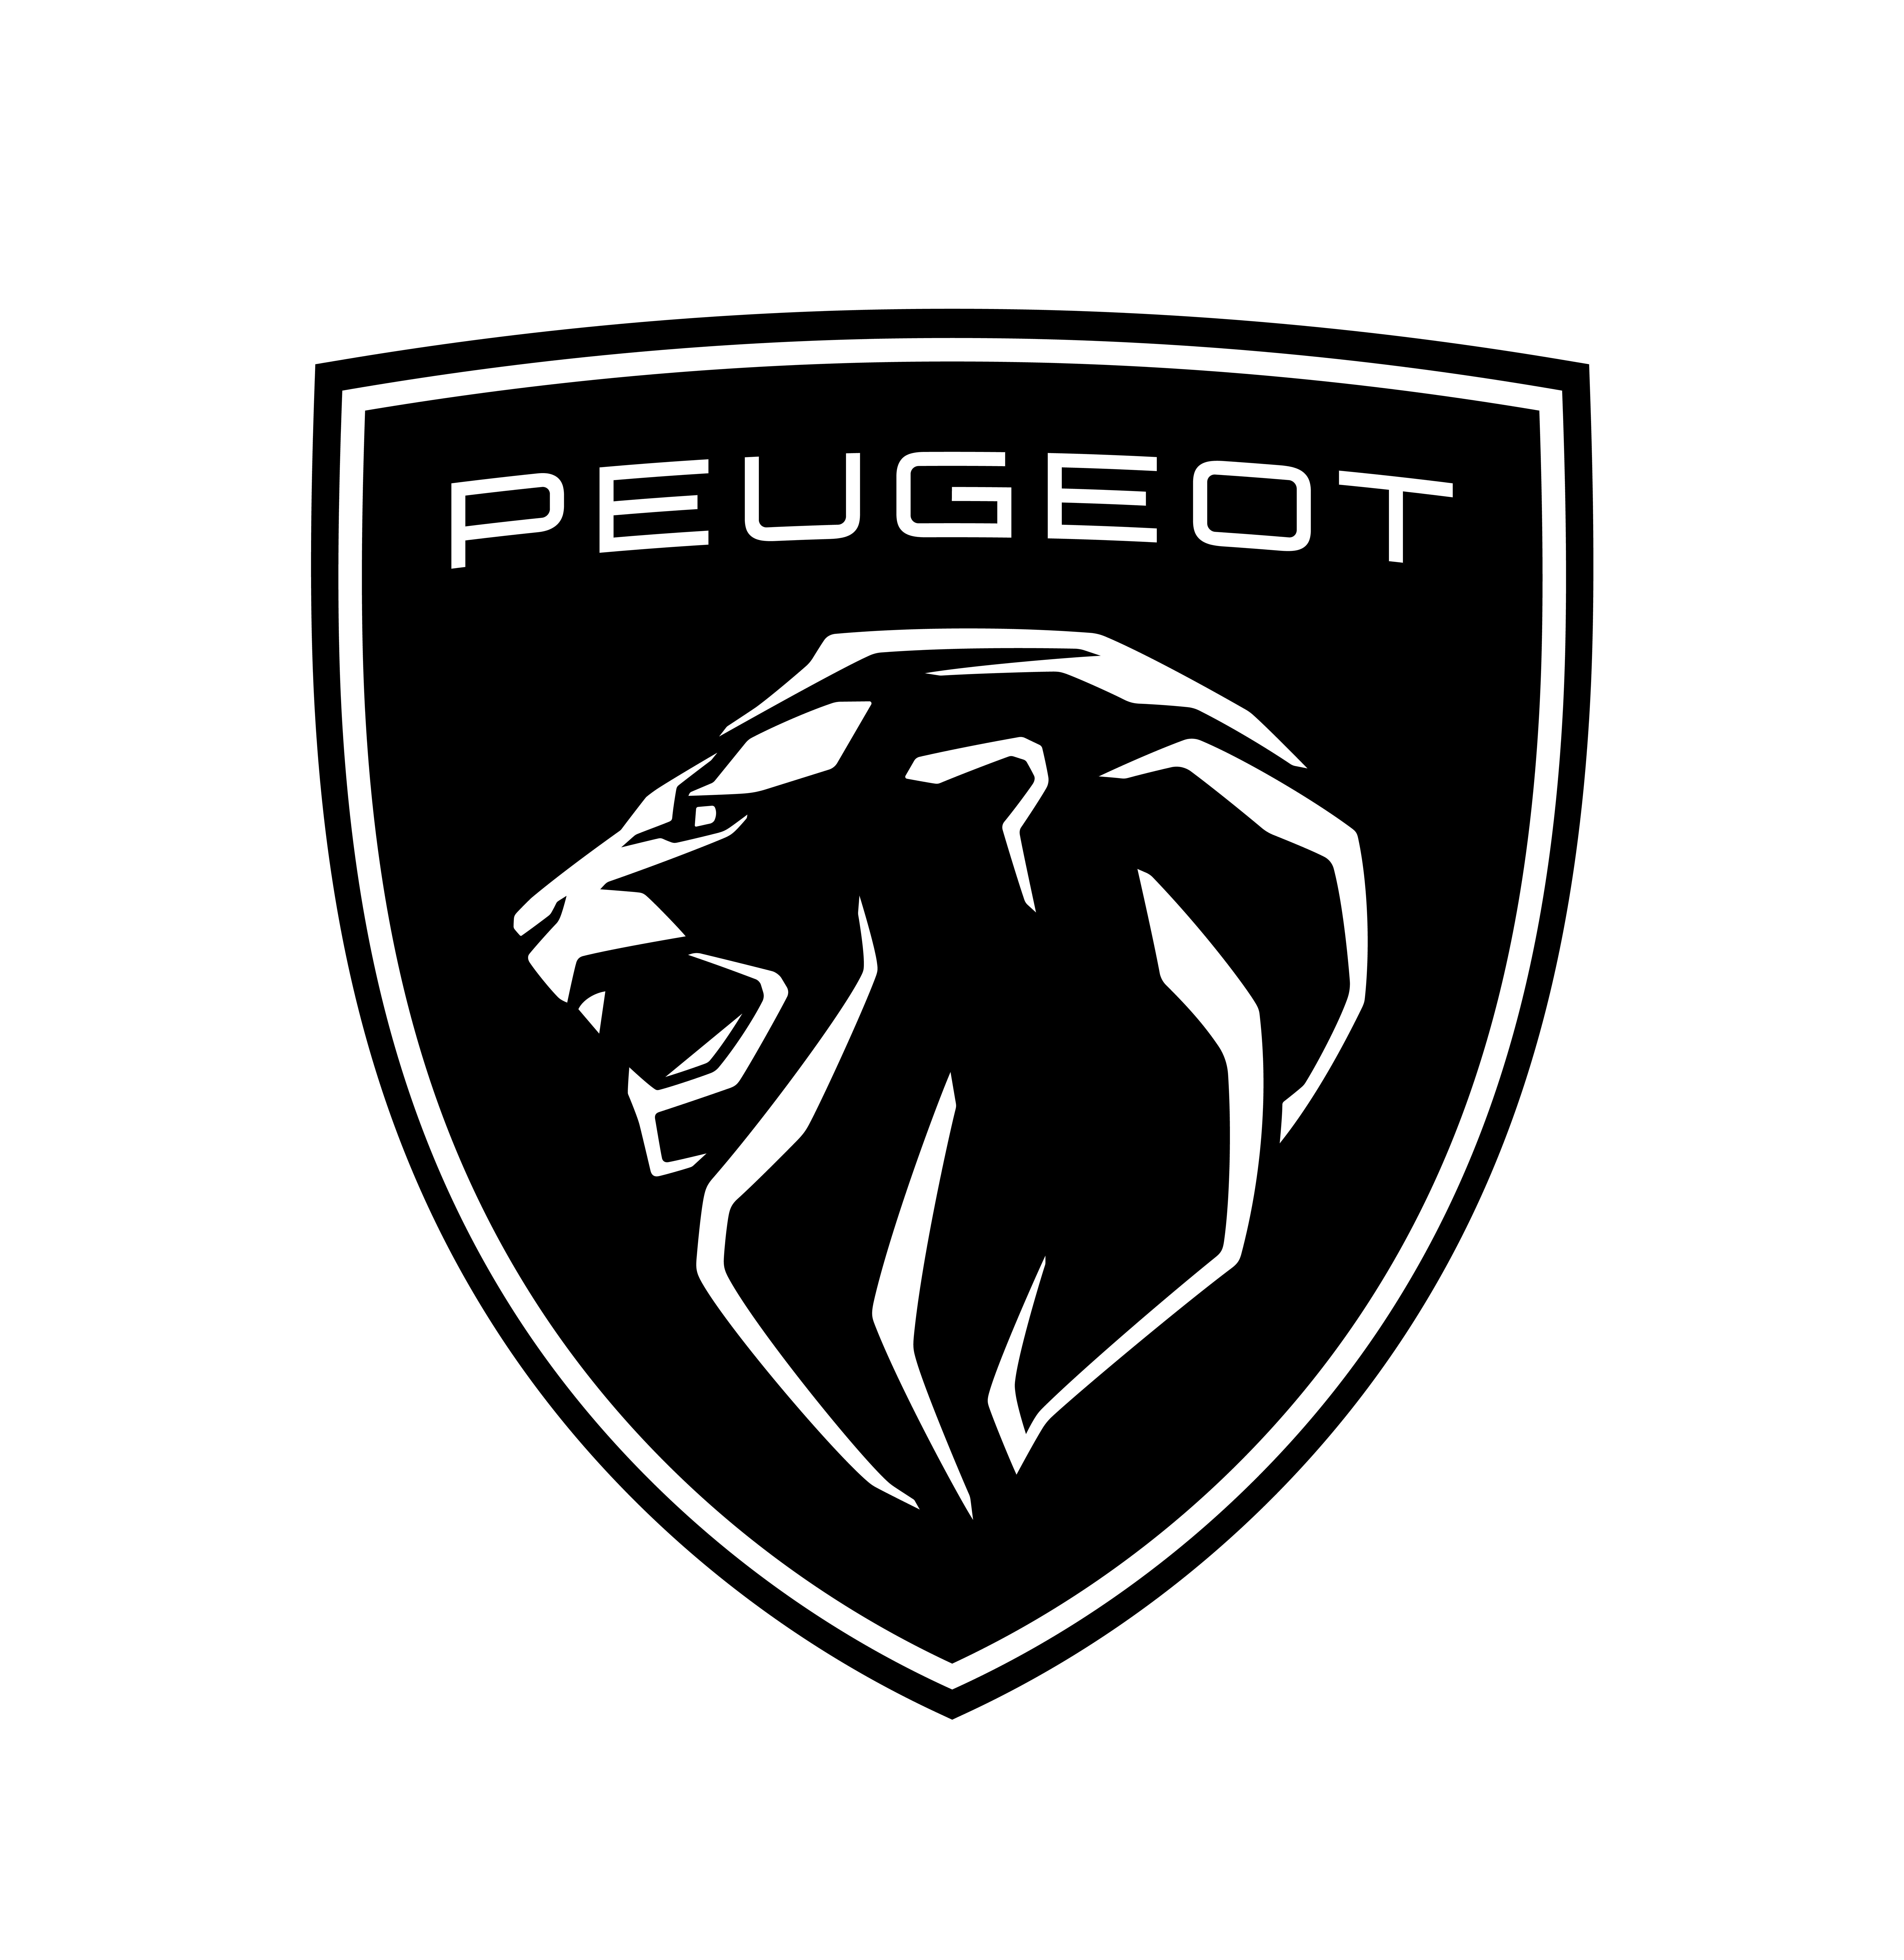 Peugeot Finland